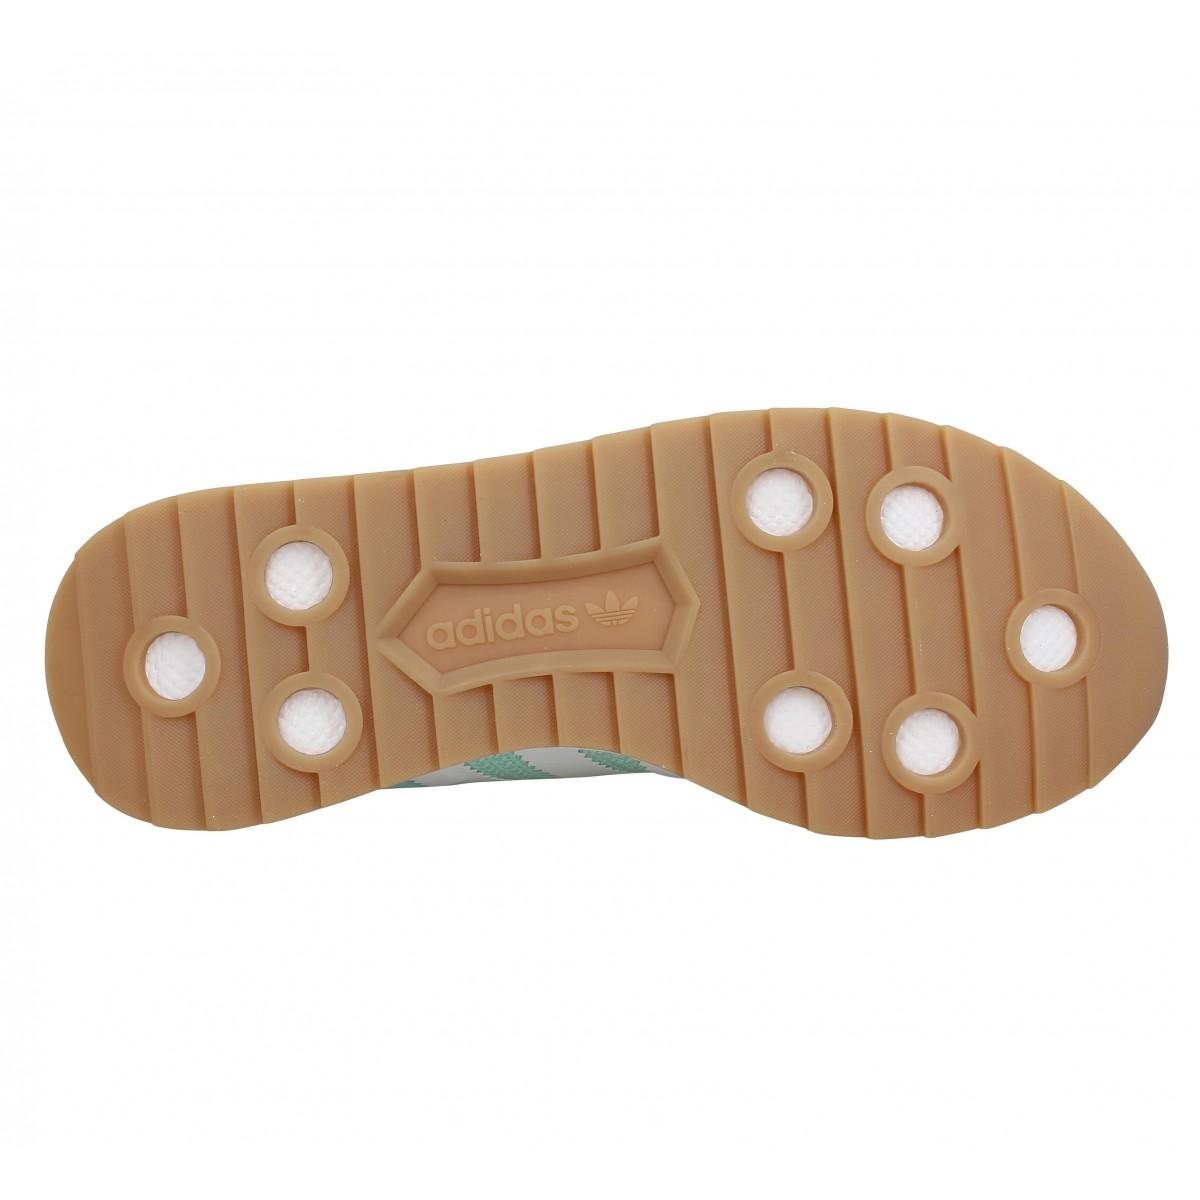 online store f4675 3cec3 Baskets ADIDAS FLB Runner toile Femme Vert. 1